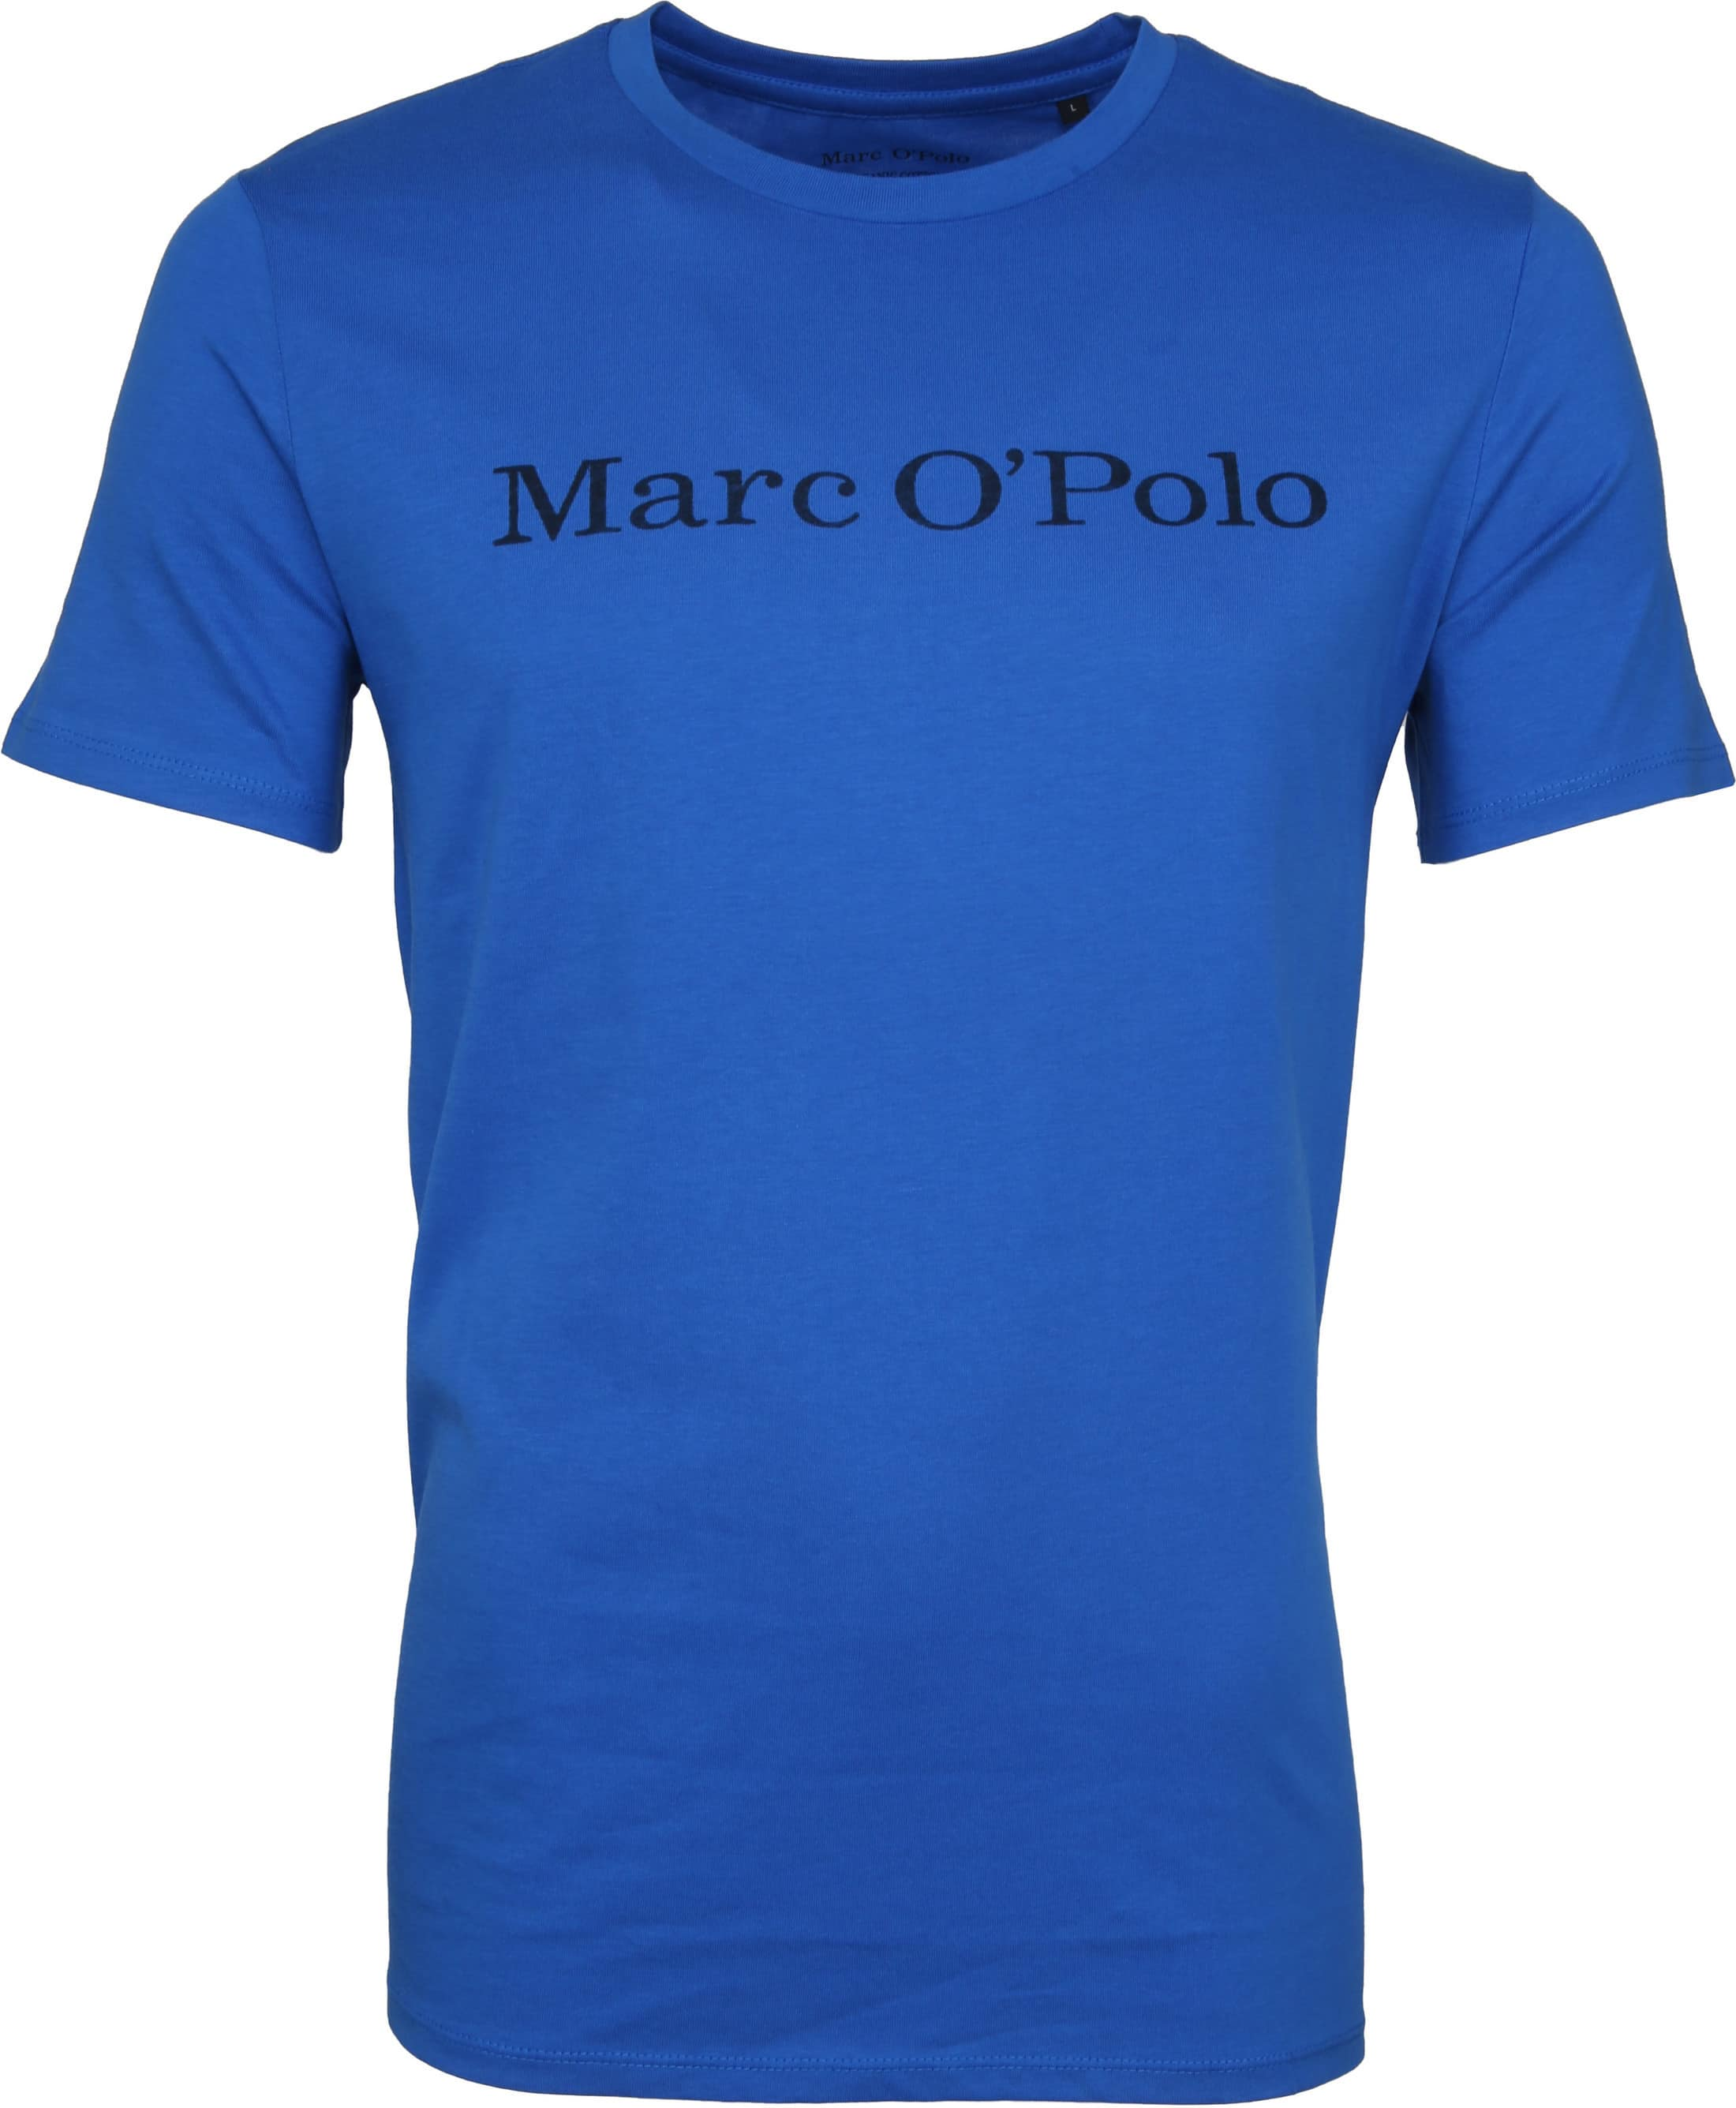 Marc O'Polo T-Shirt Victoria Blau foto 0